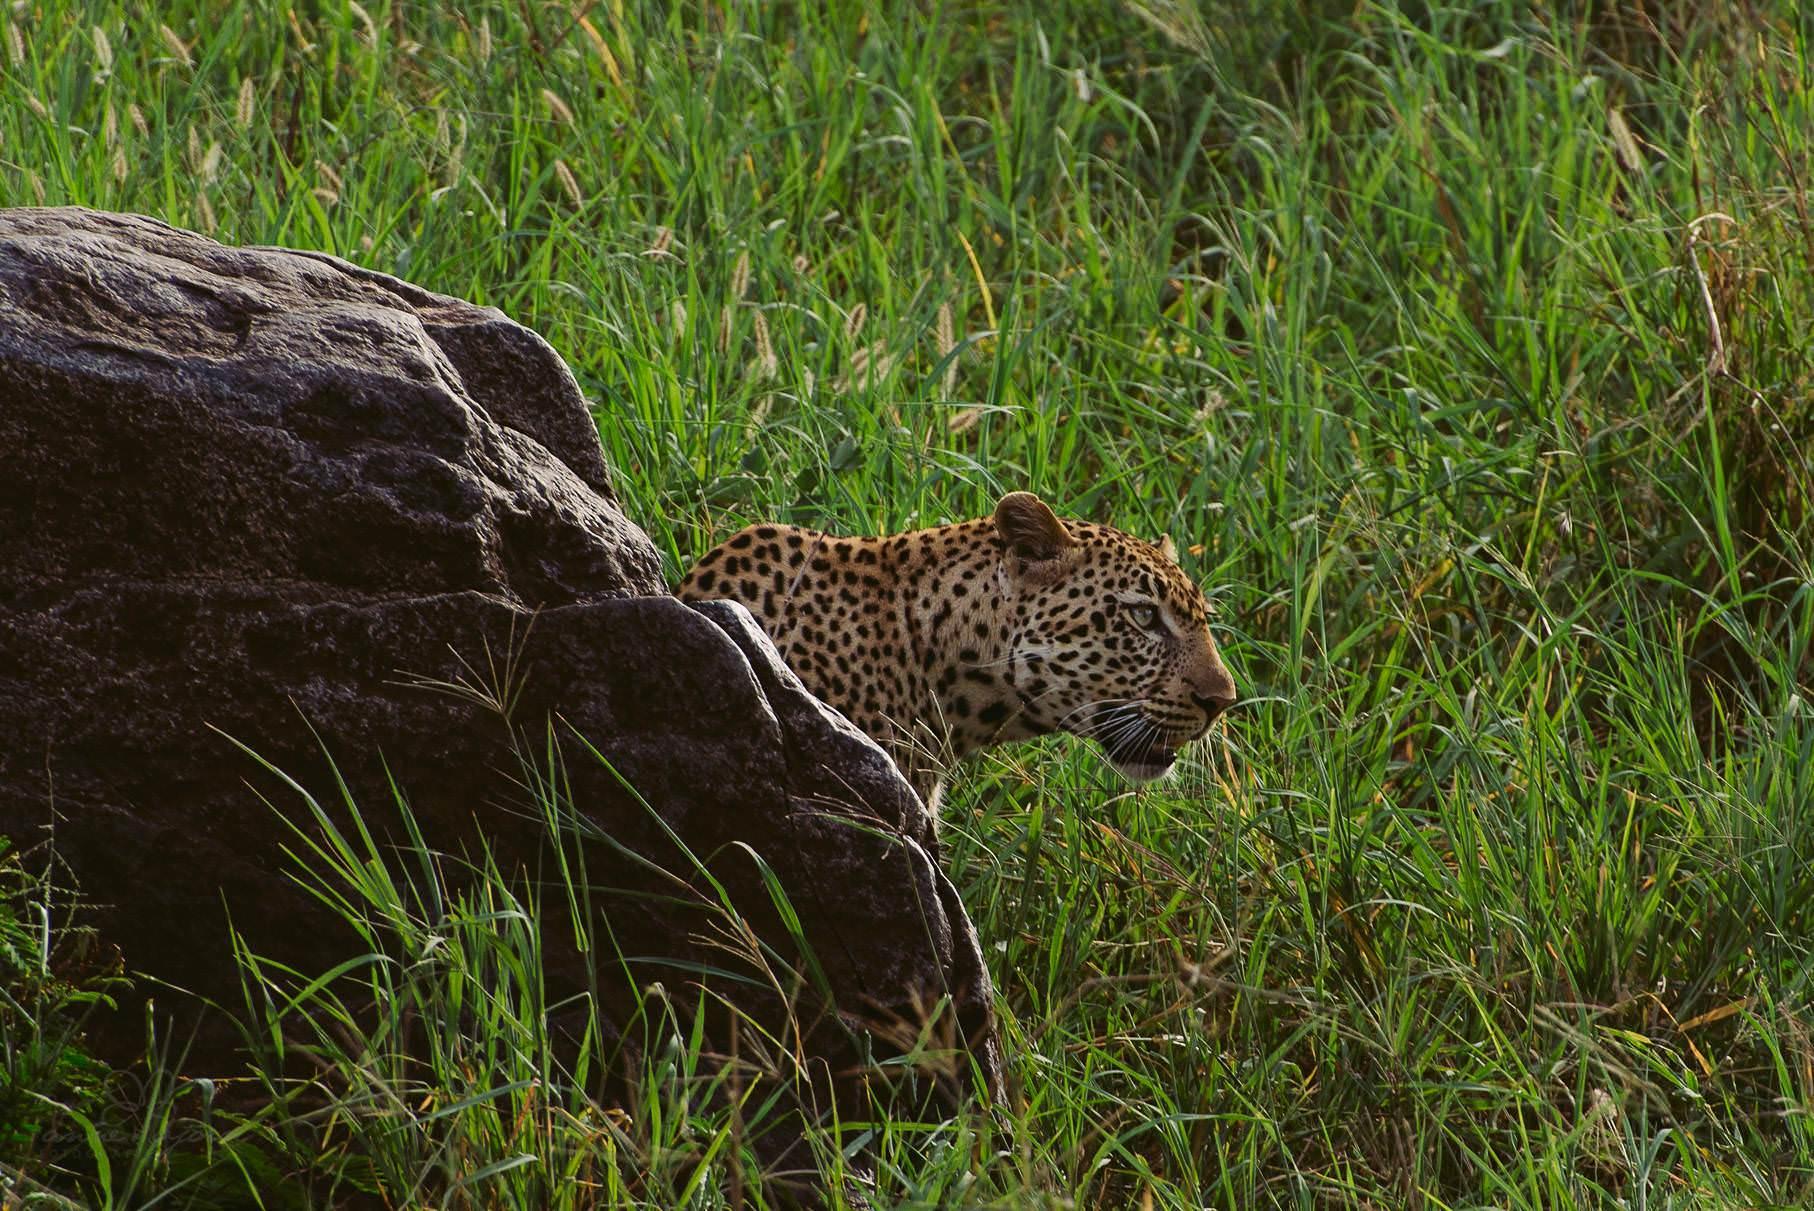 0078 tansania nd8 2191 anne bjoern fotografie hochzeitsfotograf hamburg - This is Tanzania - Serengeti, Kilimanjaro & Sansibar